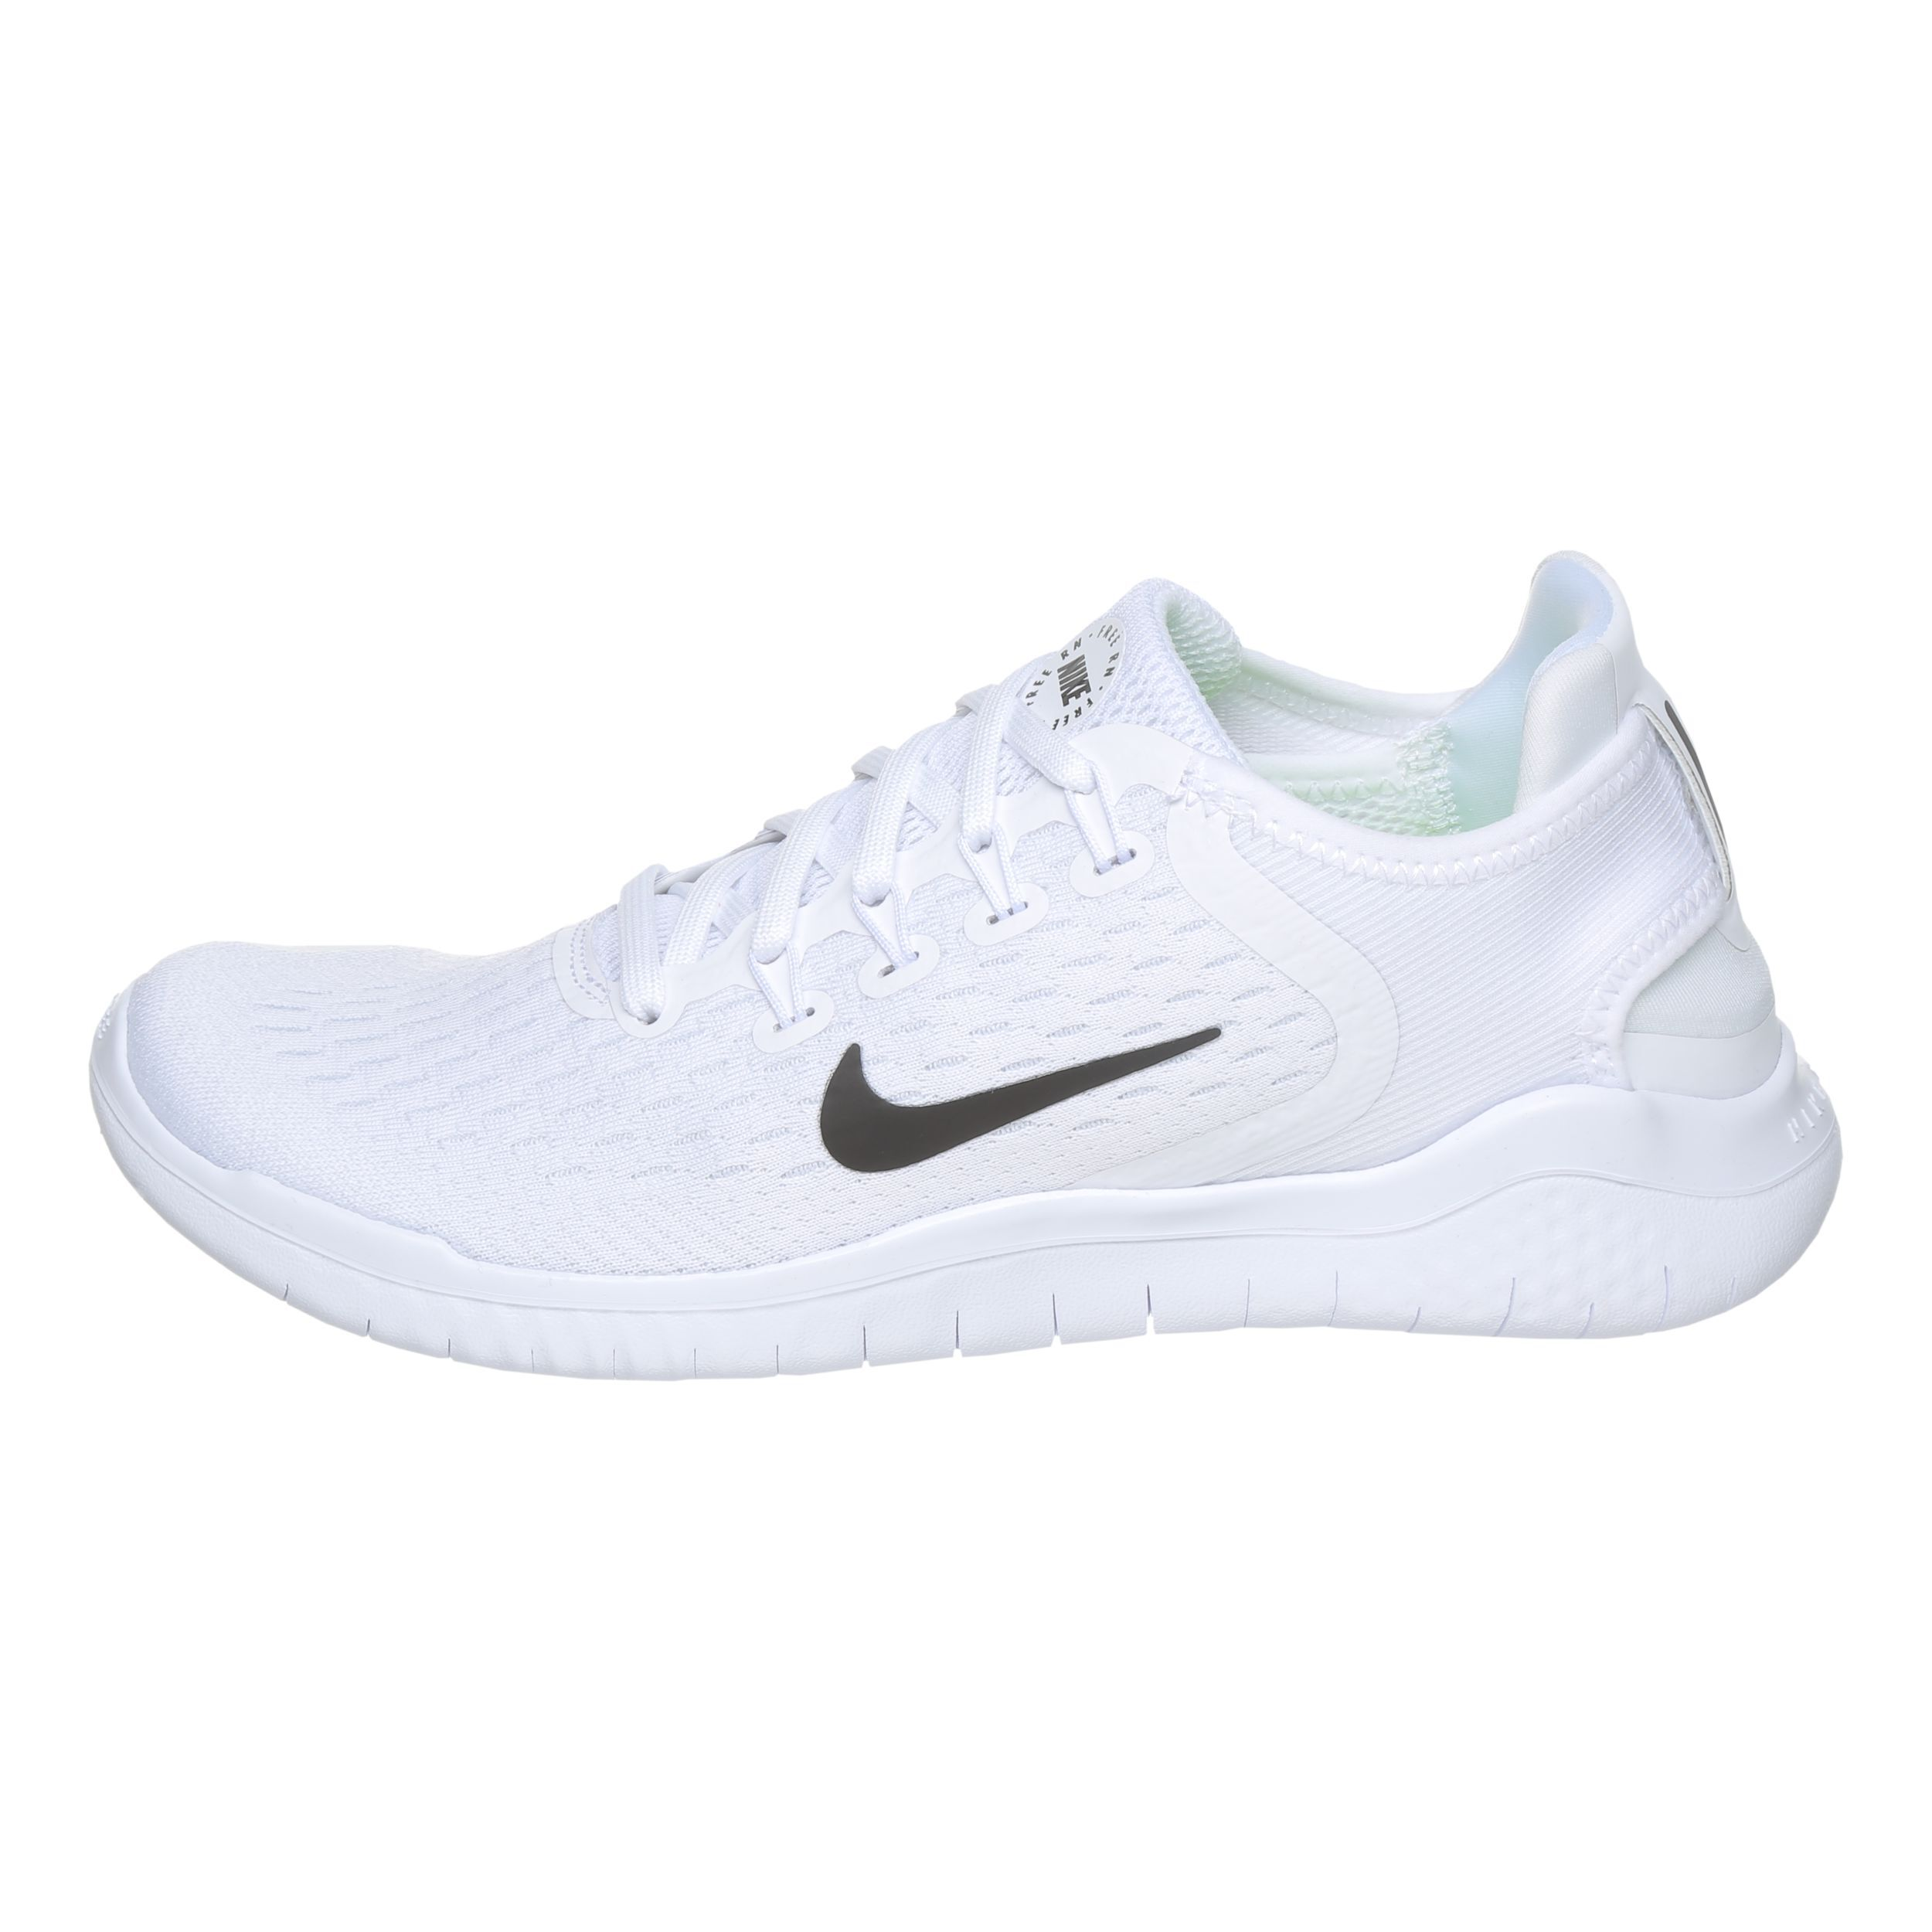 Nike Free Run 2018 Natural-Running Schuh Damen - Weiß, Schwarz ...